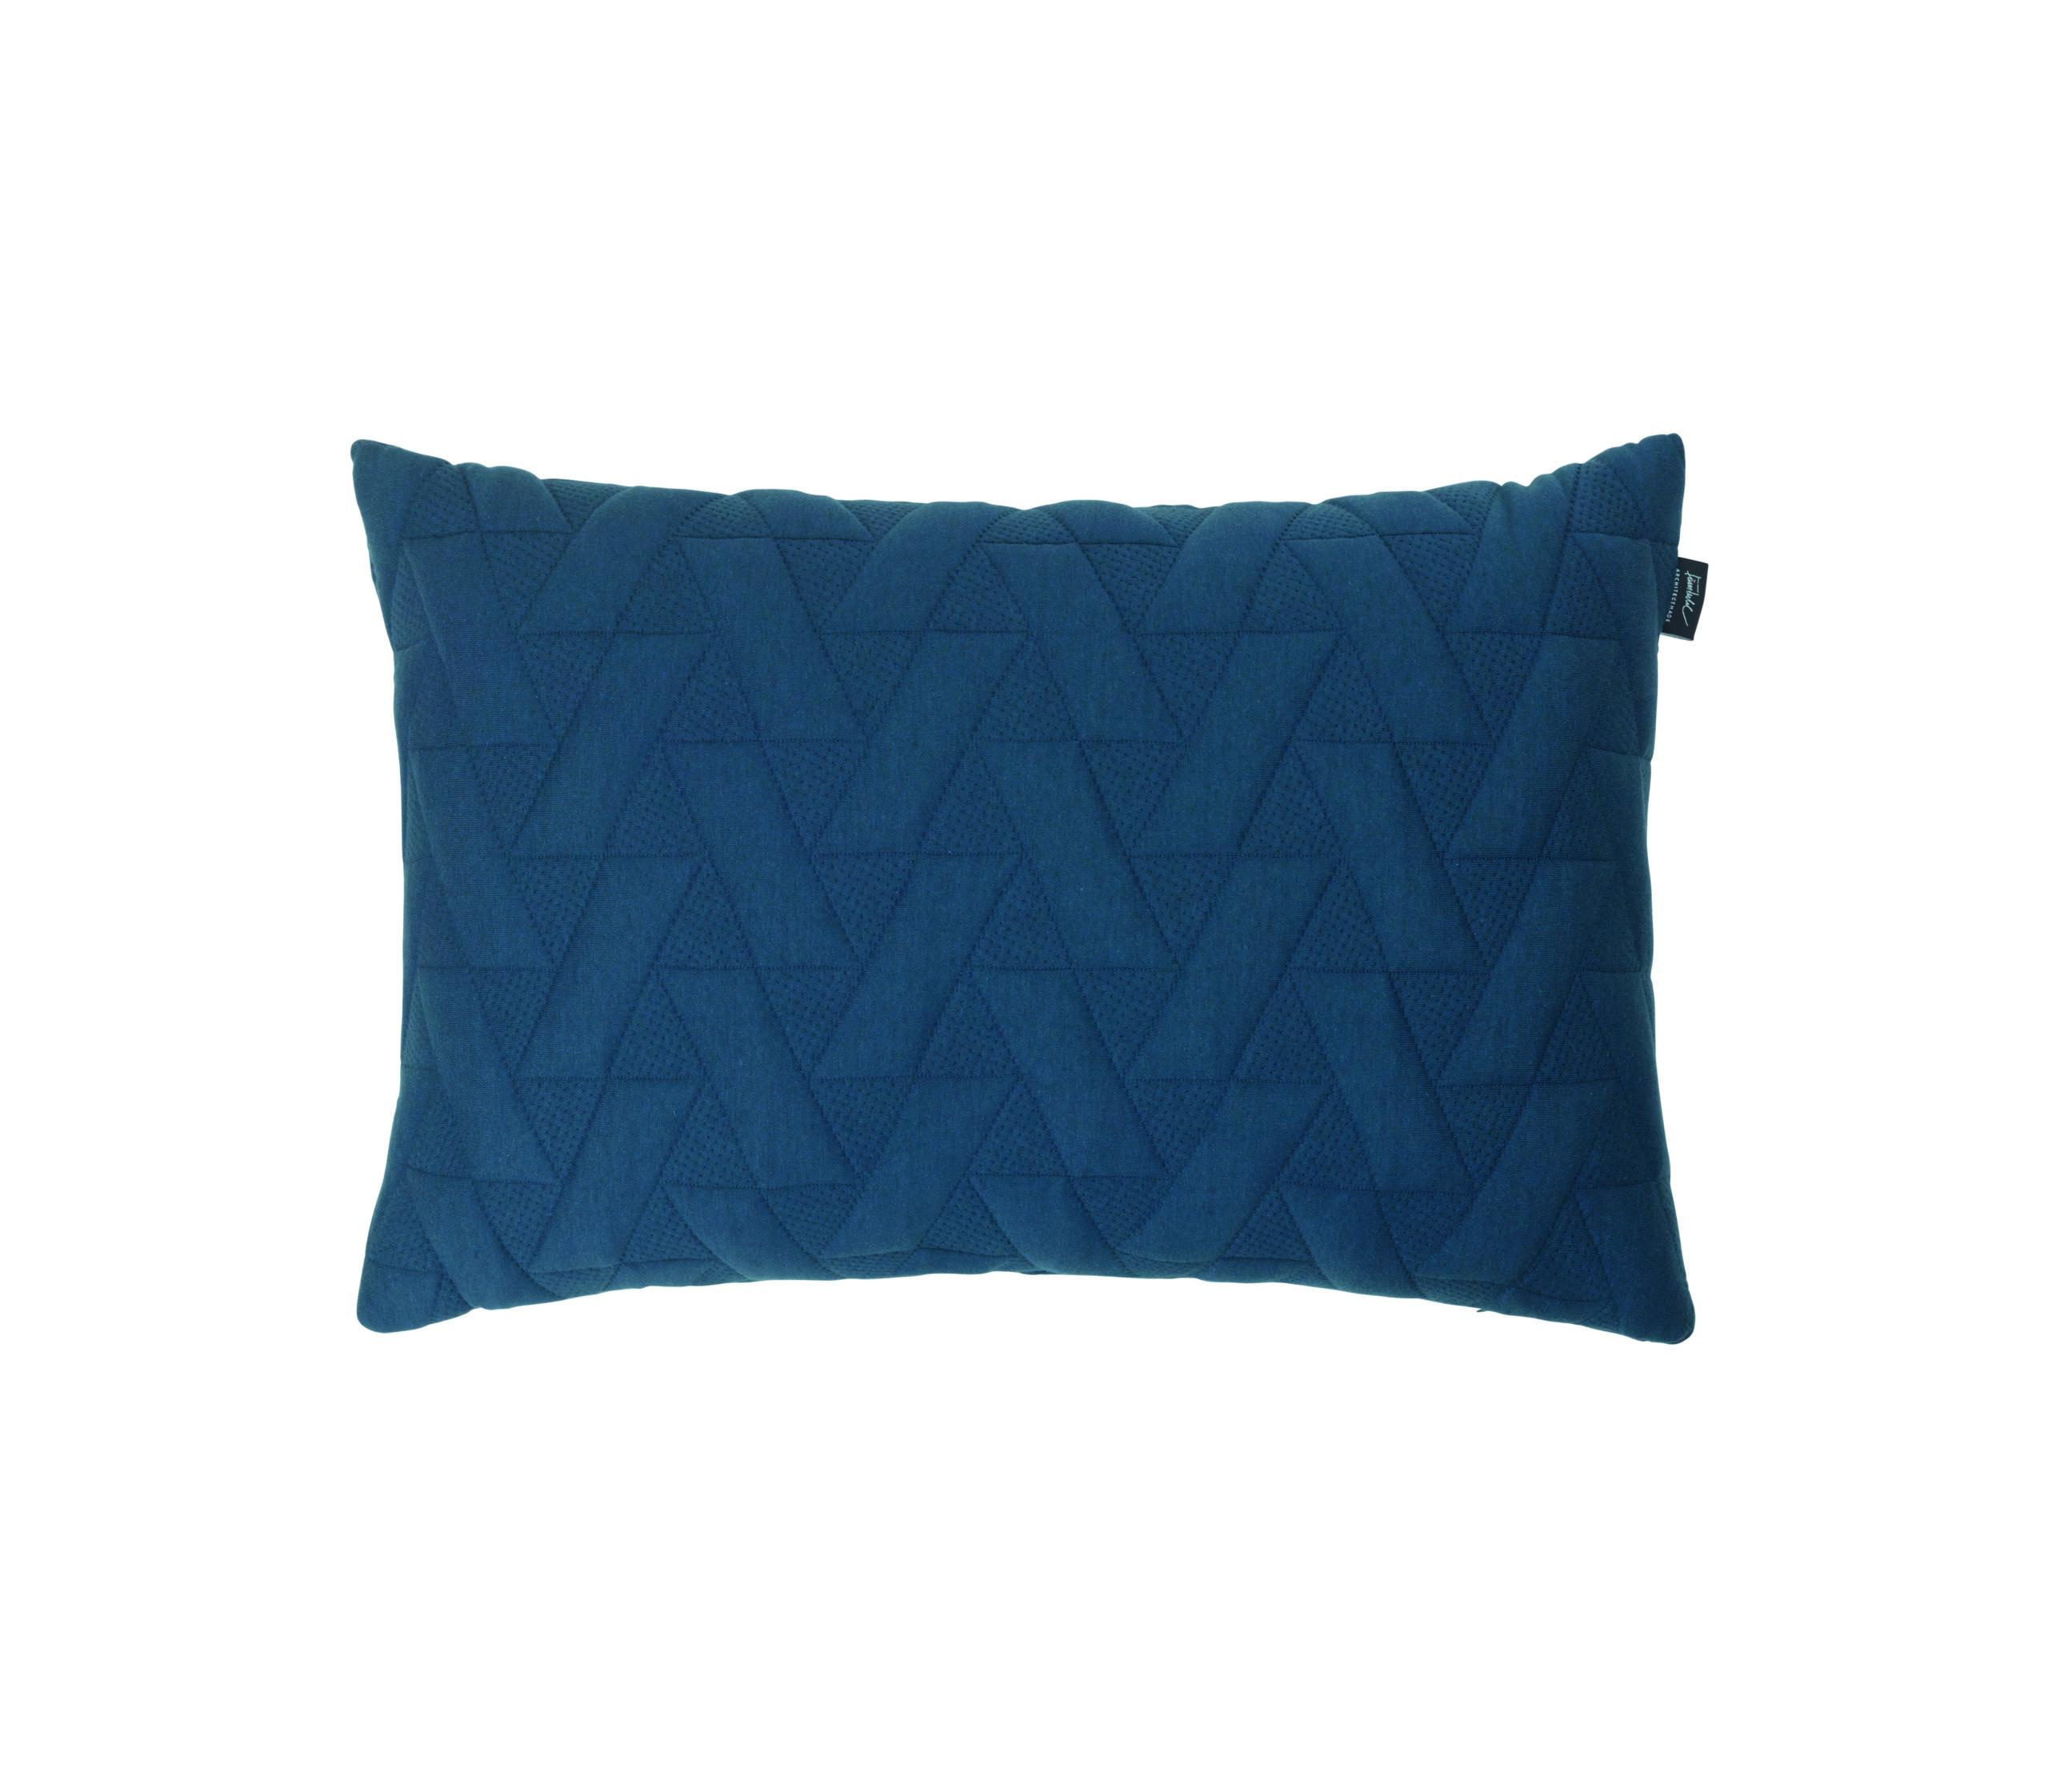 Architectmade-FJ-Pattern-40x60-Pillow-Blue-Organic-Cotton-Finn-Juhl